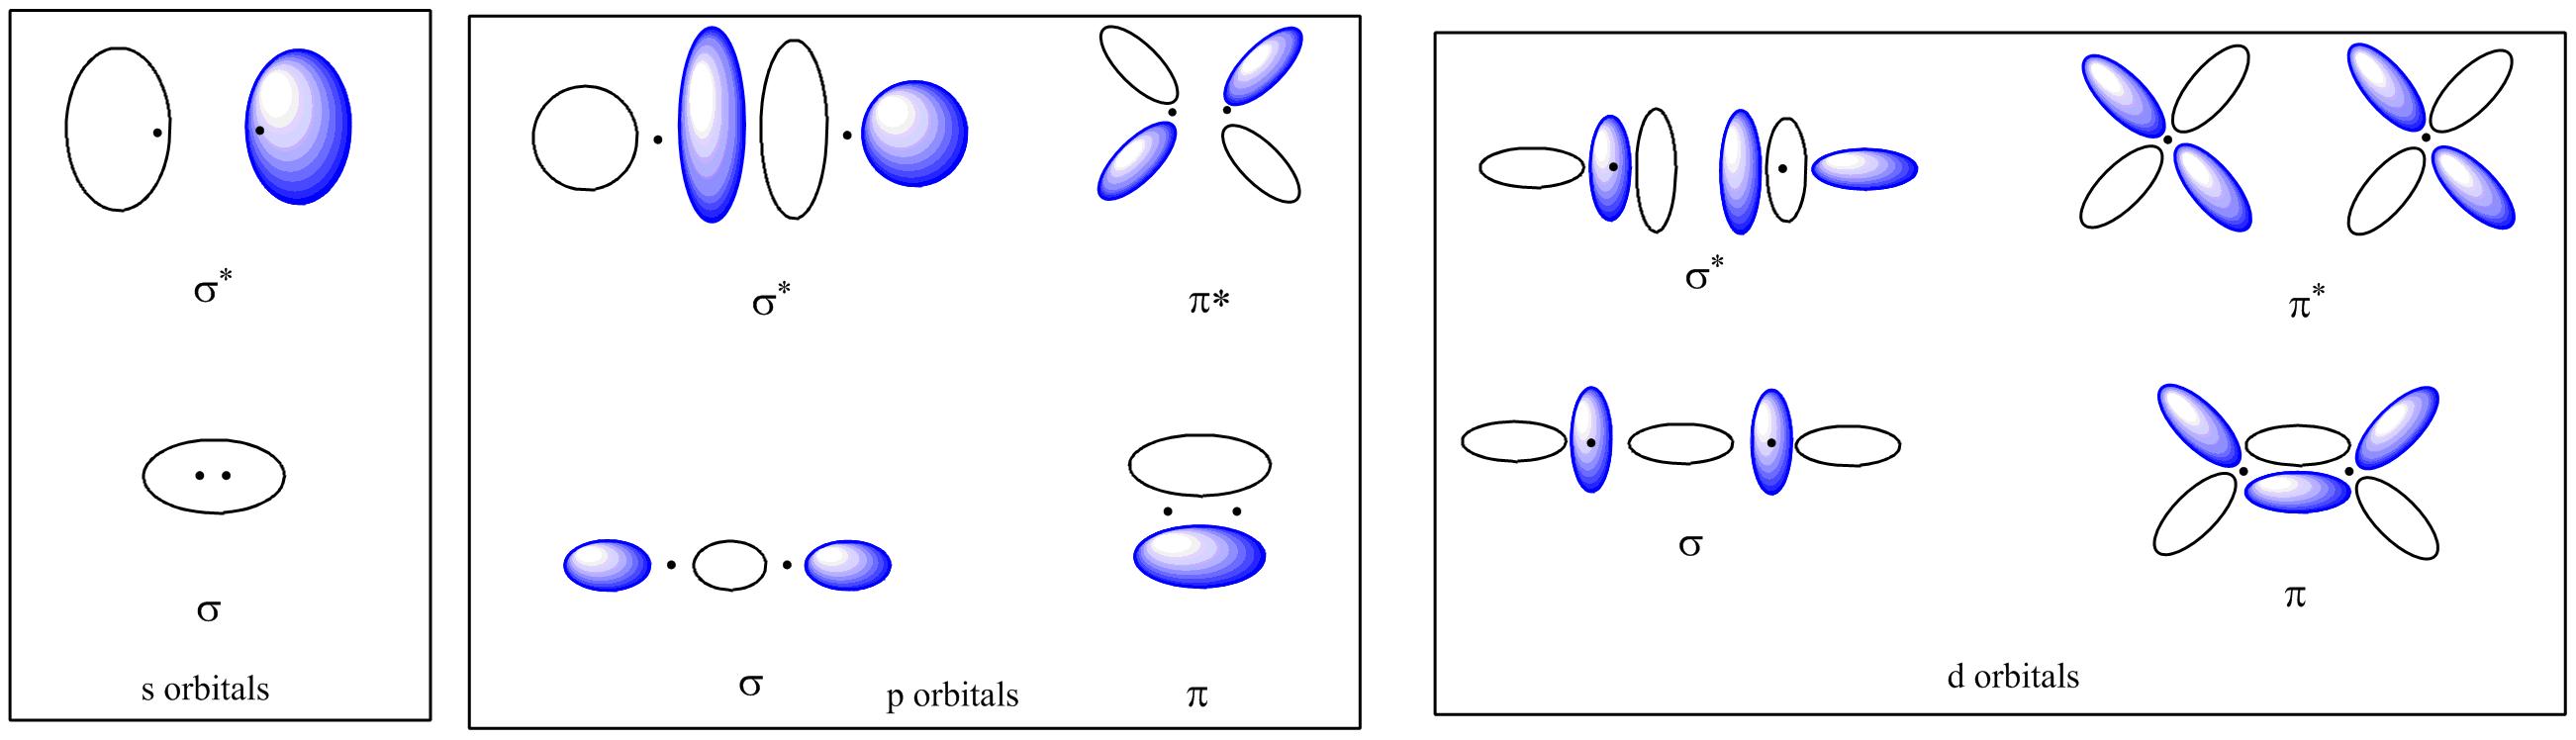 Bonding and anti-bonding in s,p, and d orbitals [3]